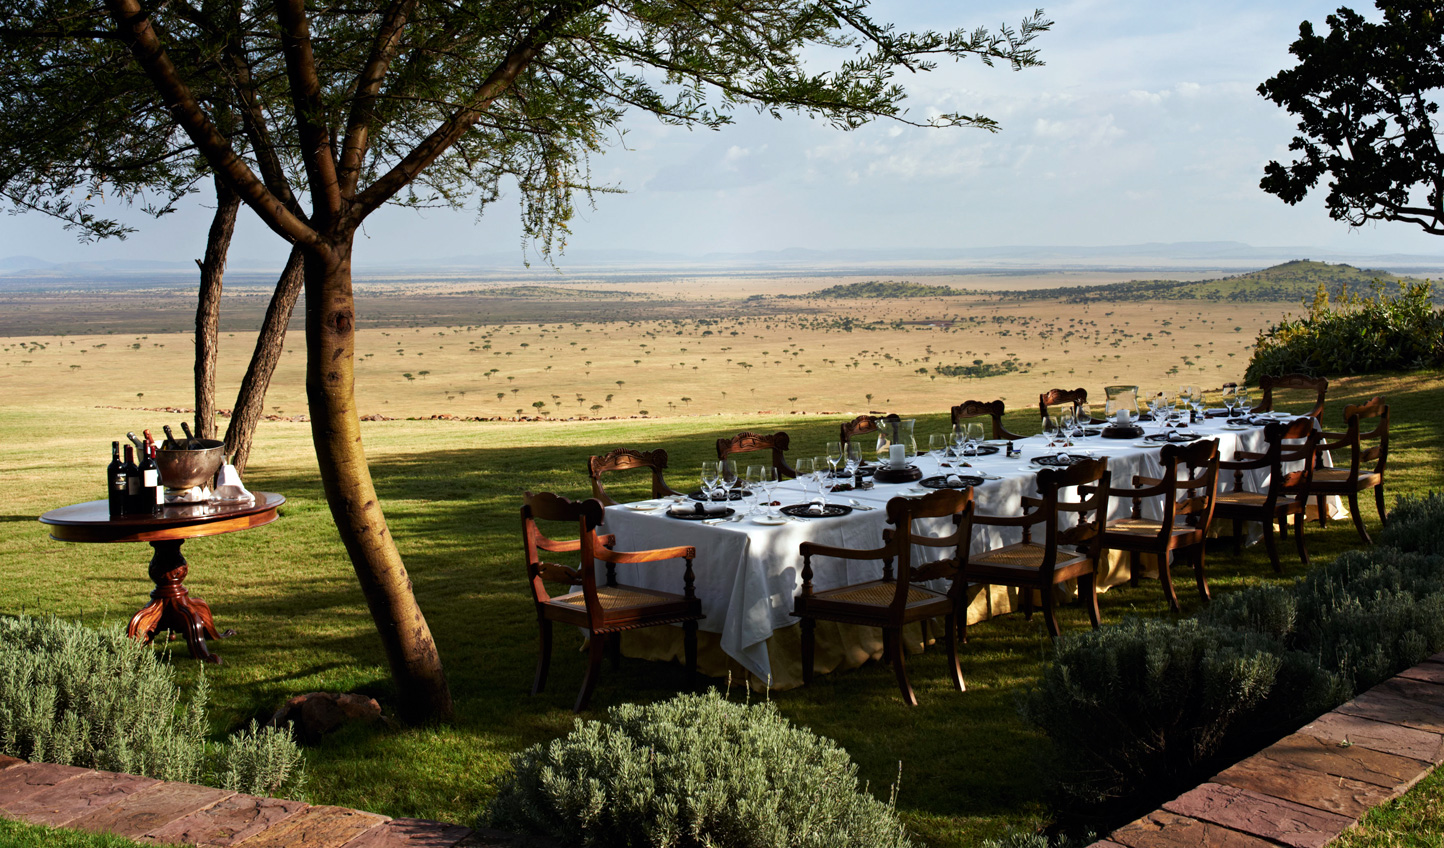 Dine out at Singita Sasakwa and admire the never ending views